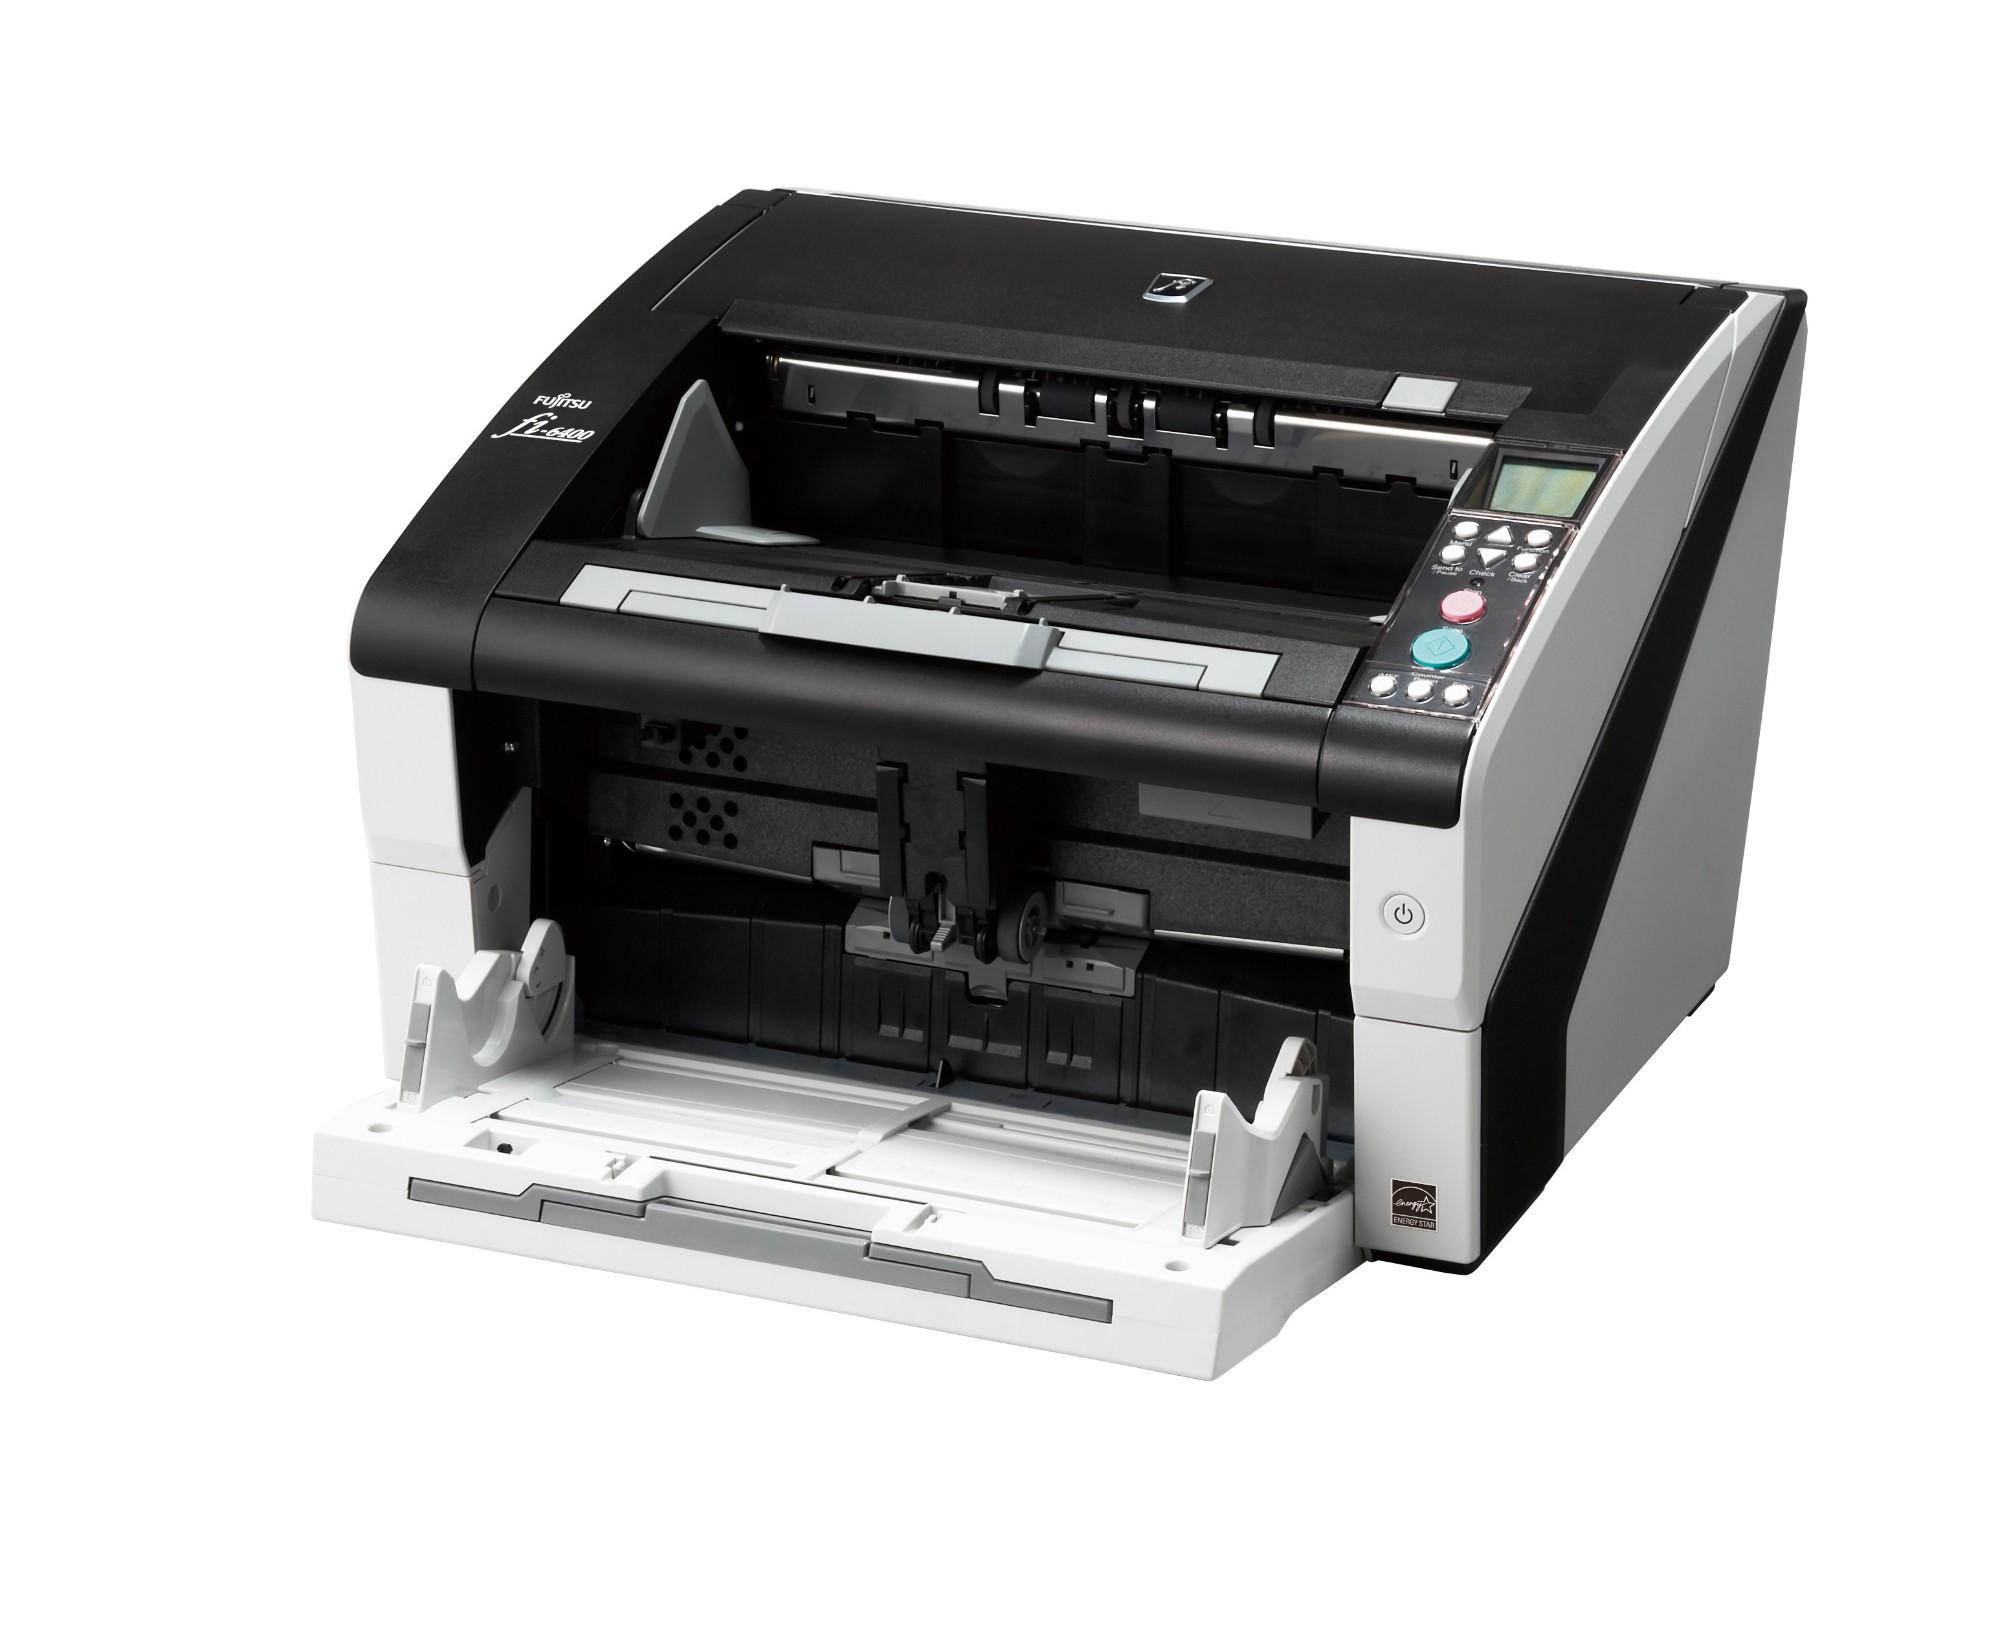 manual scan for chanmel 7